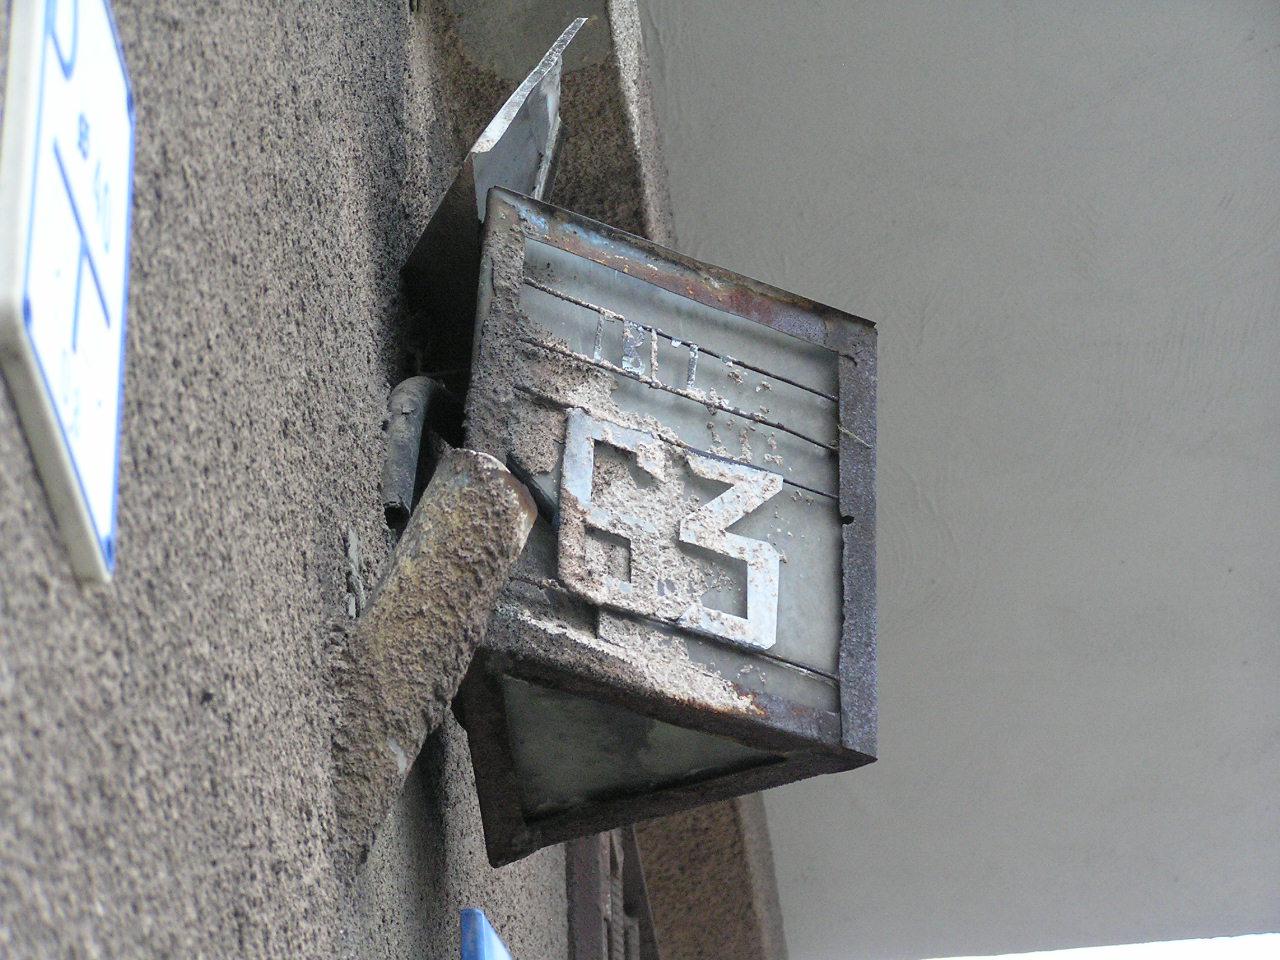 Latarenka adresowa - Kobielska 63